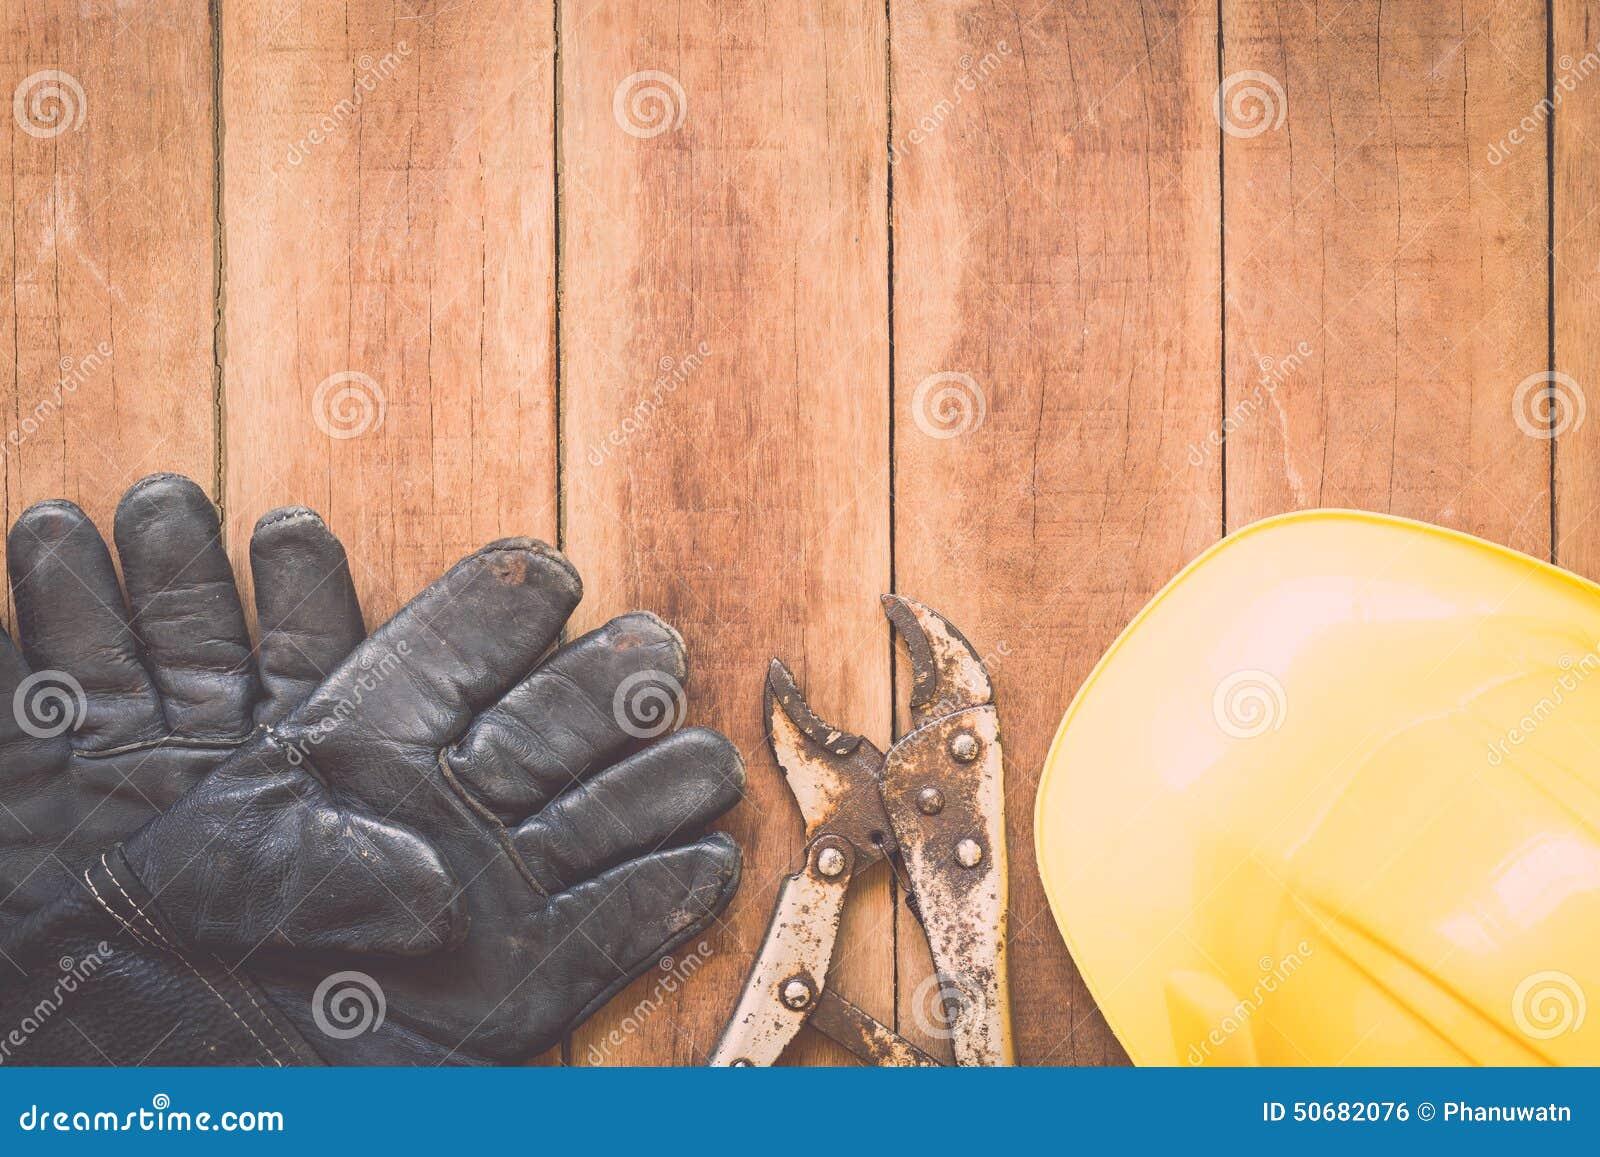 Download 在木头的被分类的工作工具 库存照片. 图片 包括有 木料, 行业, 木匠, 保护, 木匠业, 现有量, 的协助 - 50682076